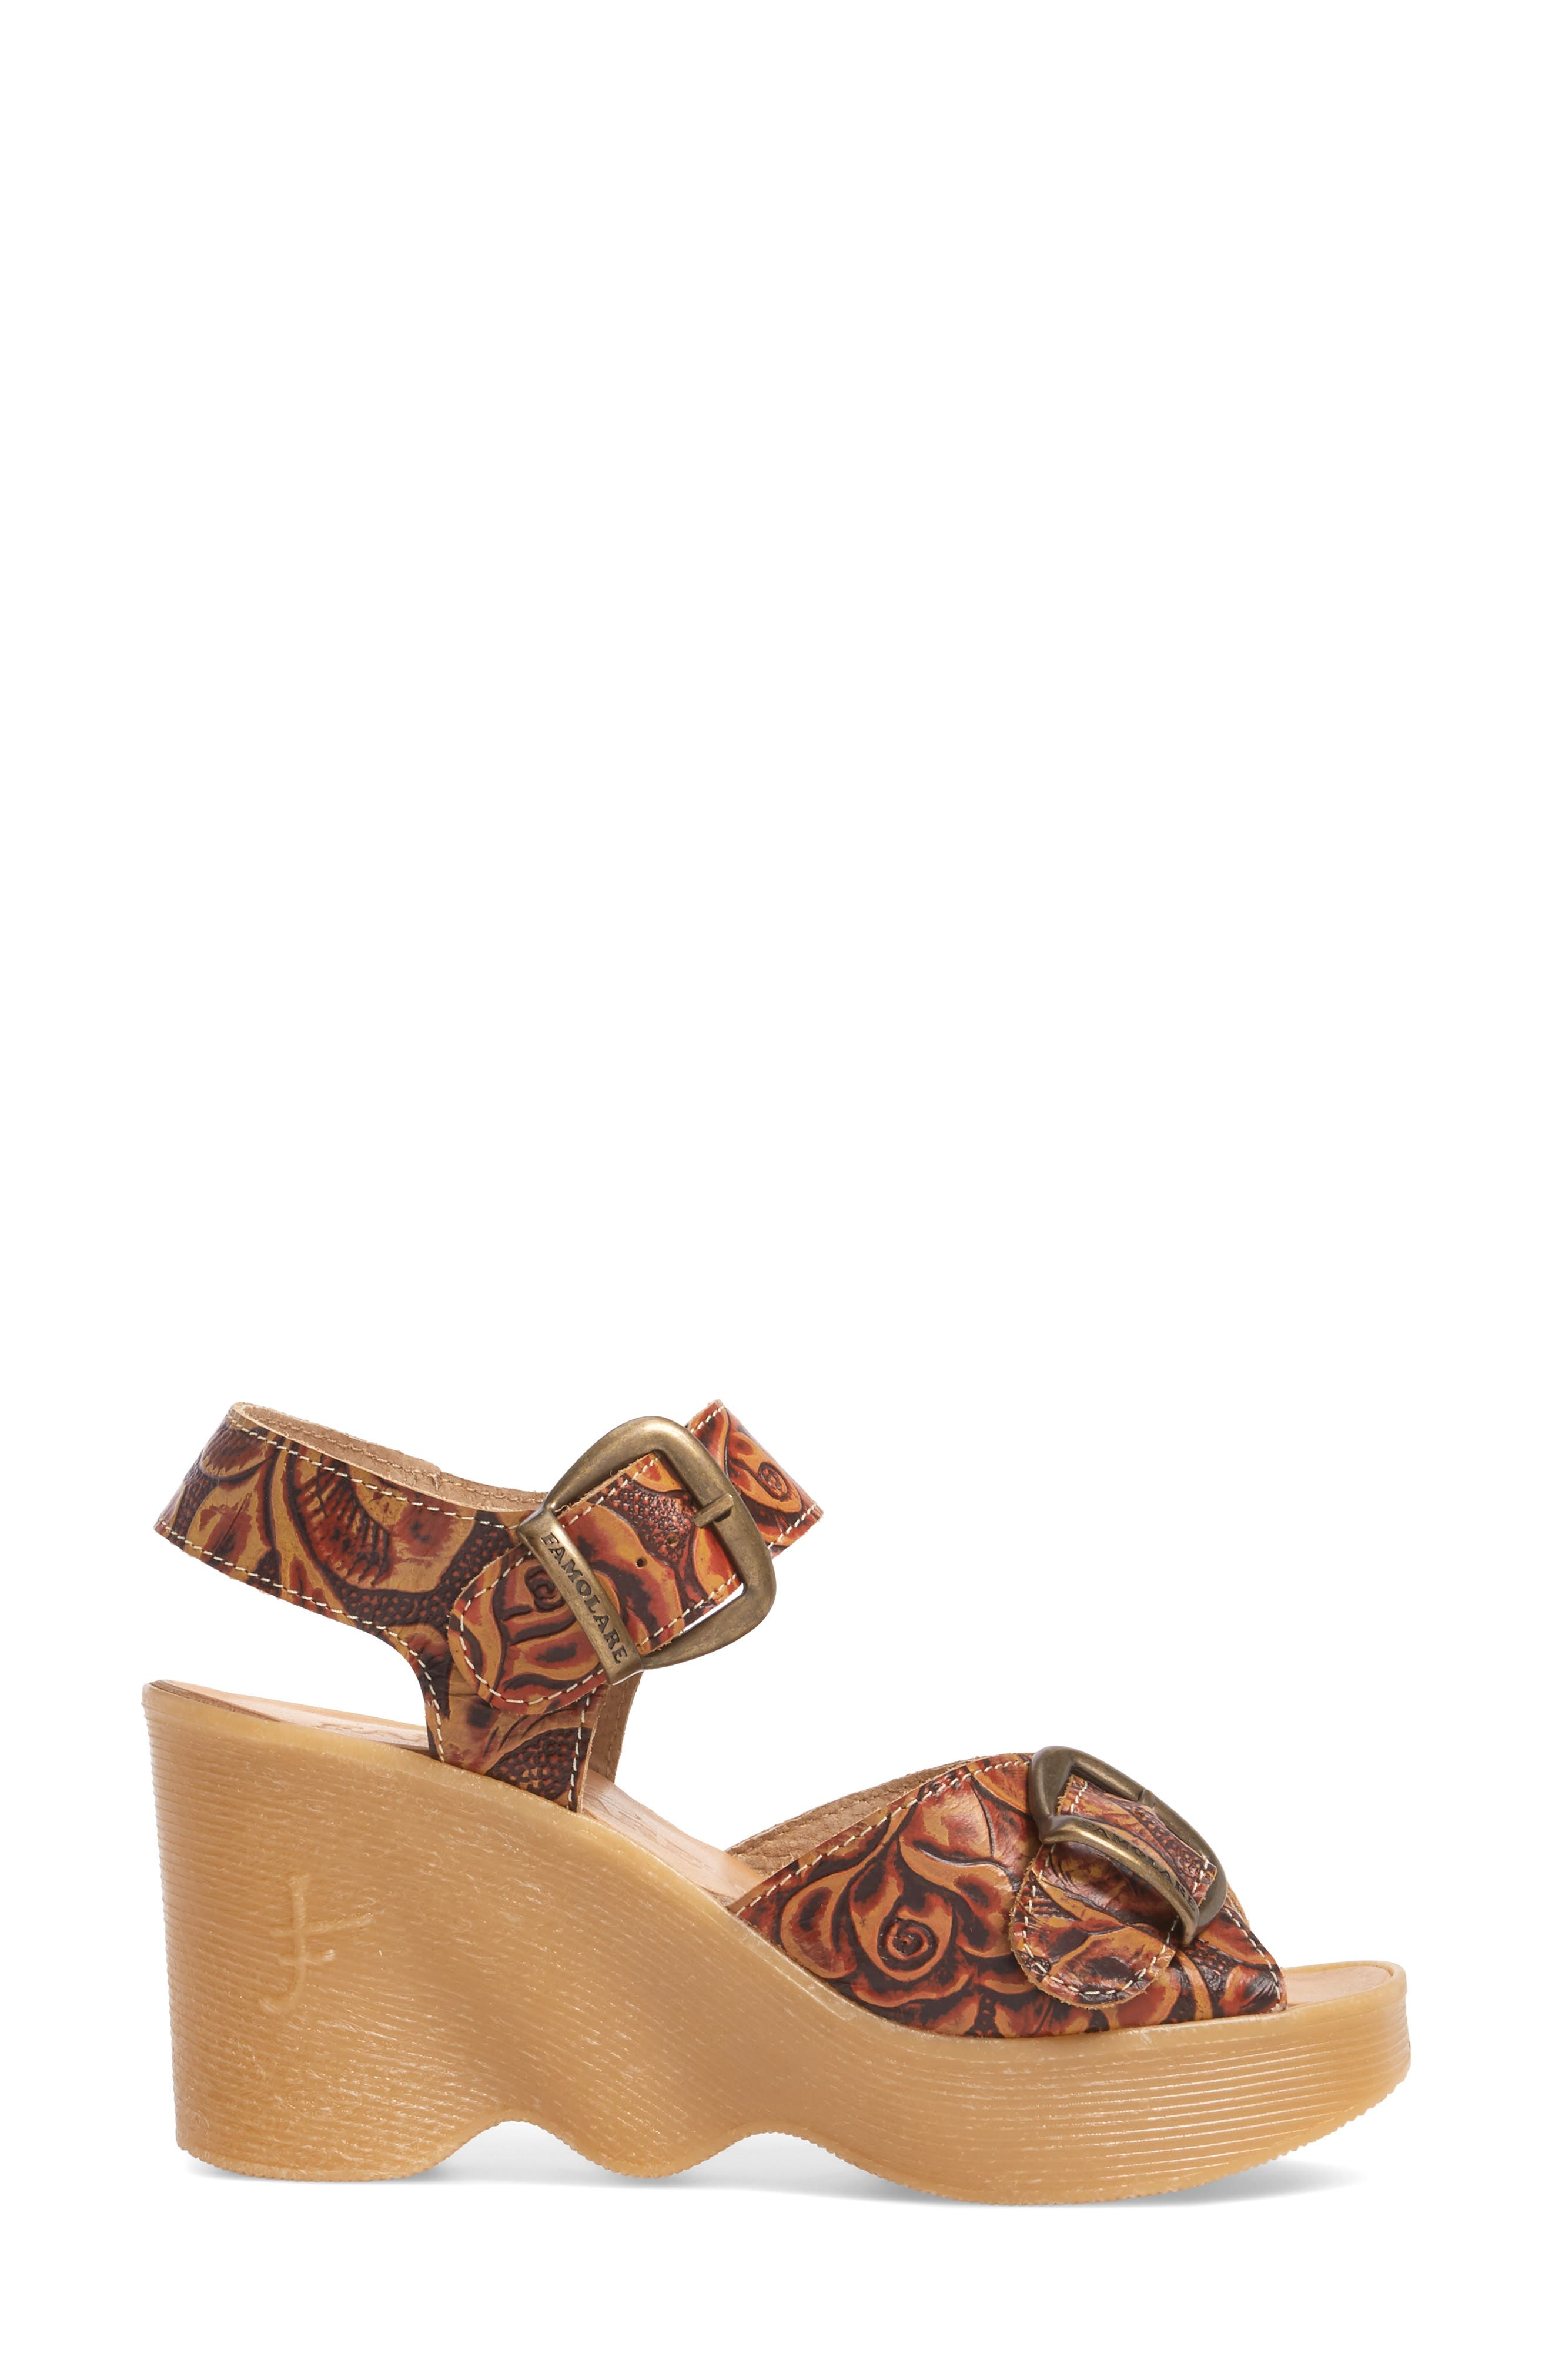 Alternate Image 3  - Famolare Double Vision Wedge Sandal (Women)